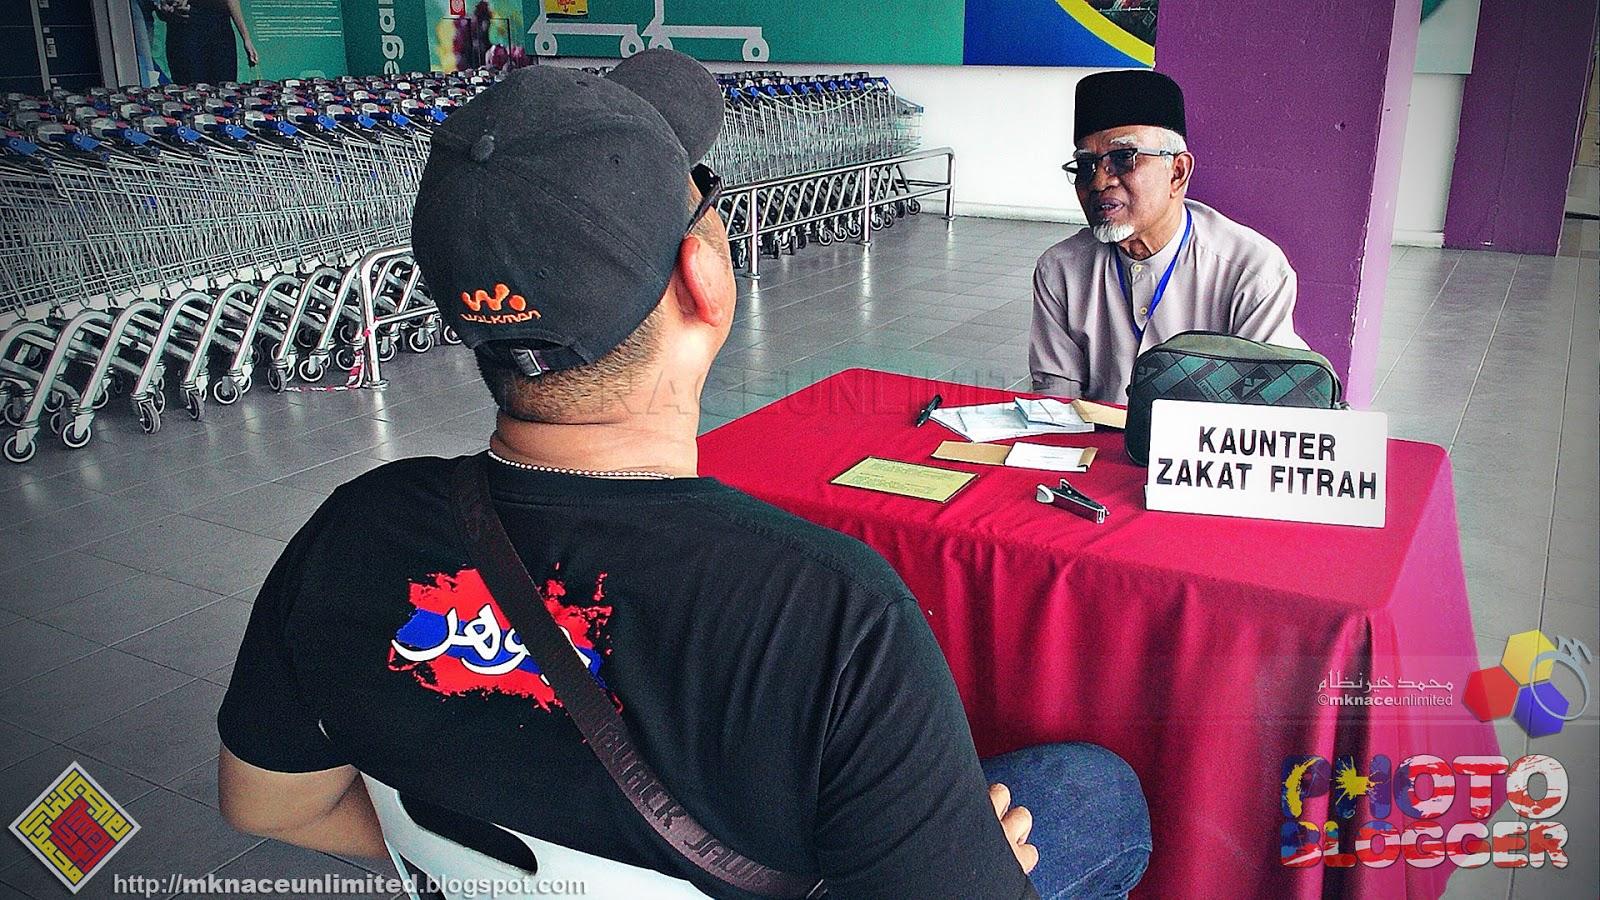 Zakat Fitrah negeri Johor 1437H   2016M - Done! 23 Jun tempohari mama ajak  gi Mydin. Nak belanja bulan. Hari yang sama aku keluar gi perbaharui lesen. c5534df788